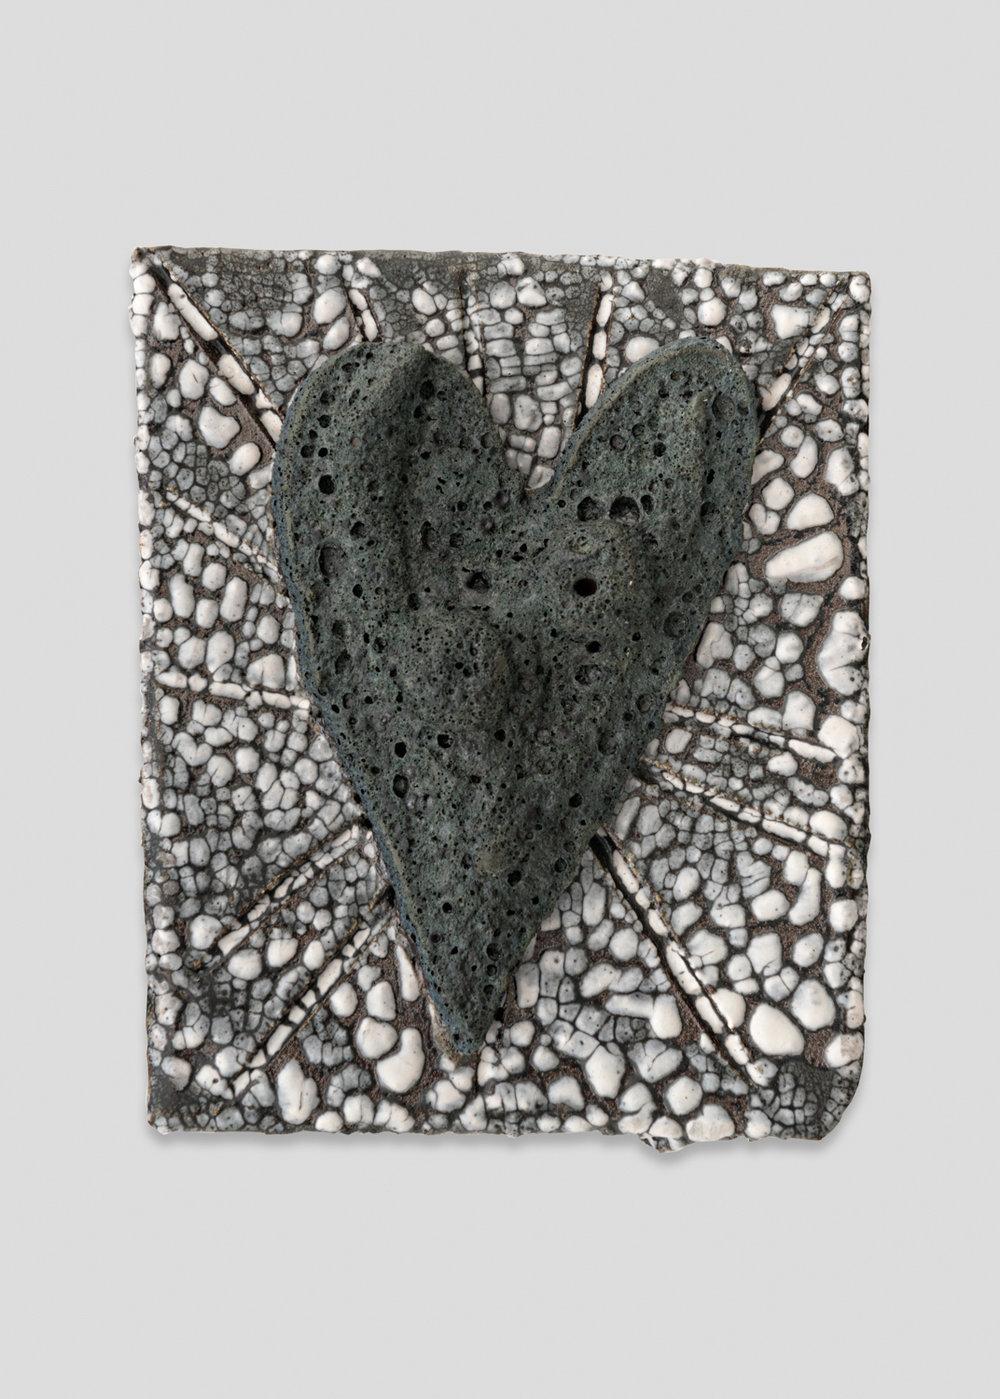 William J.O'Brien  Untitled  2017 Glazed ceramic 8h x 6 ½w x 2 ½d in WOB1236